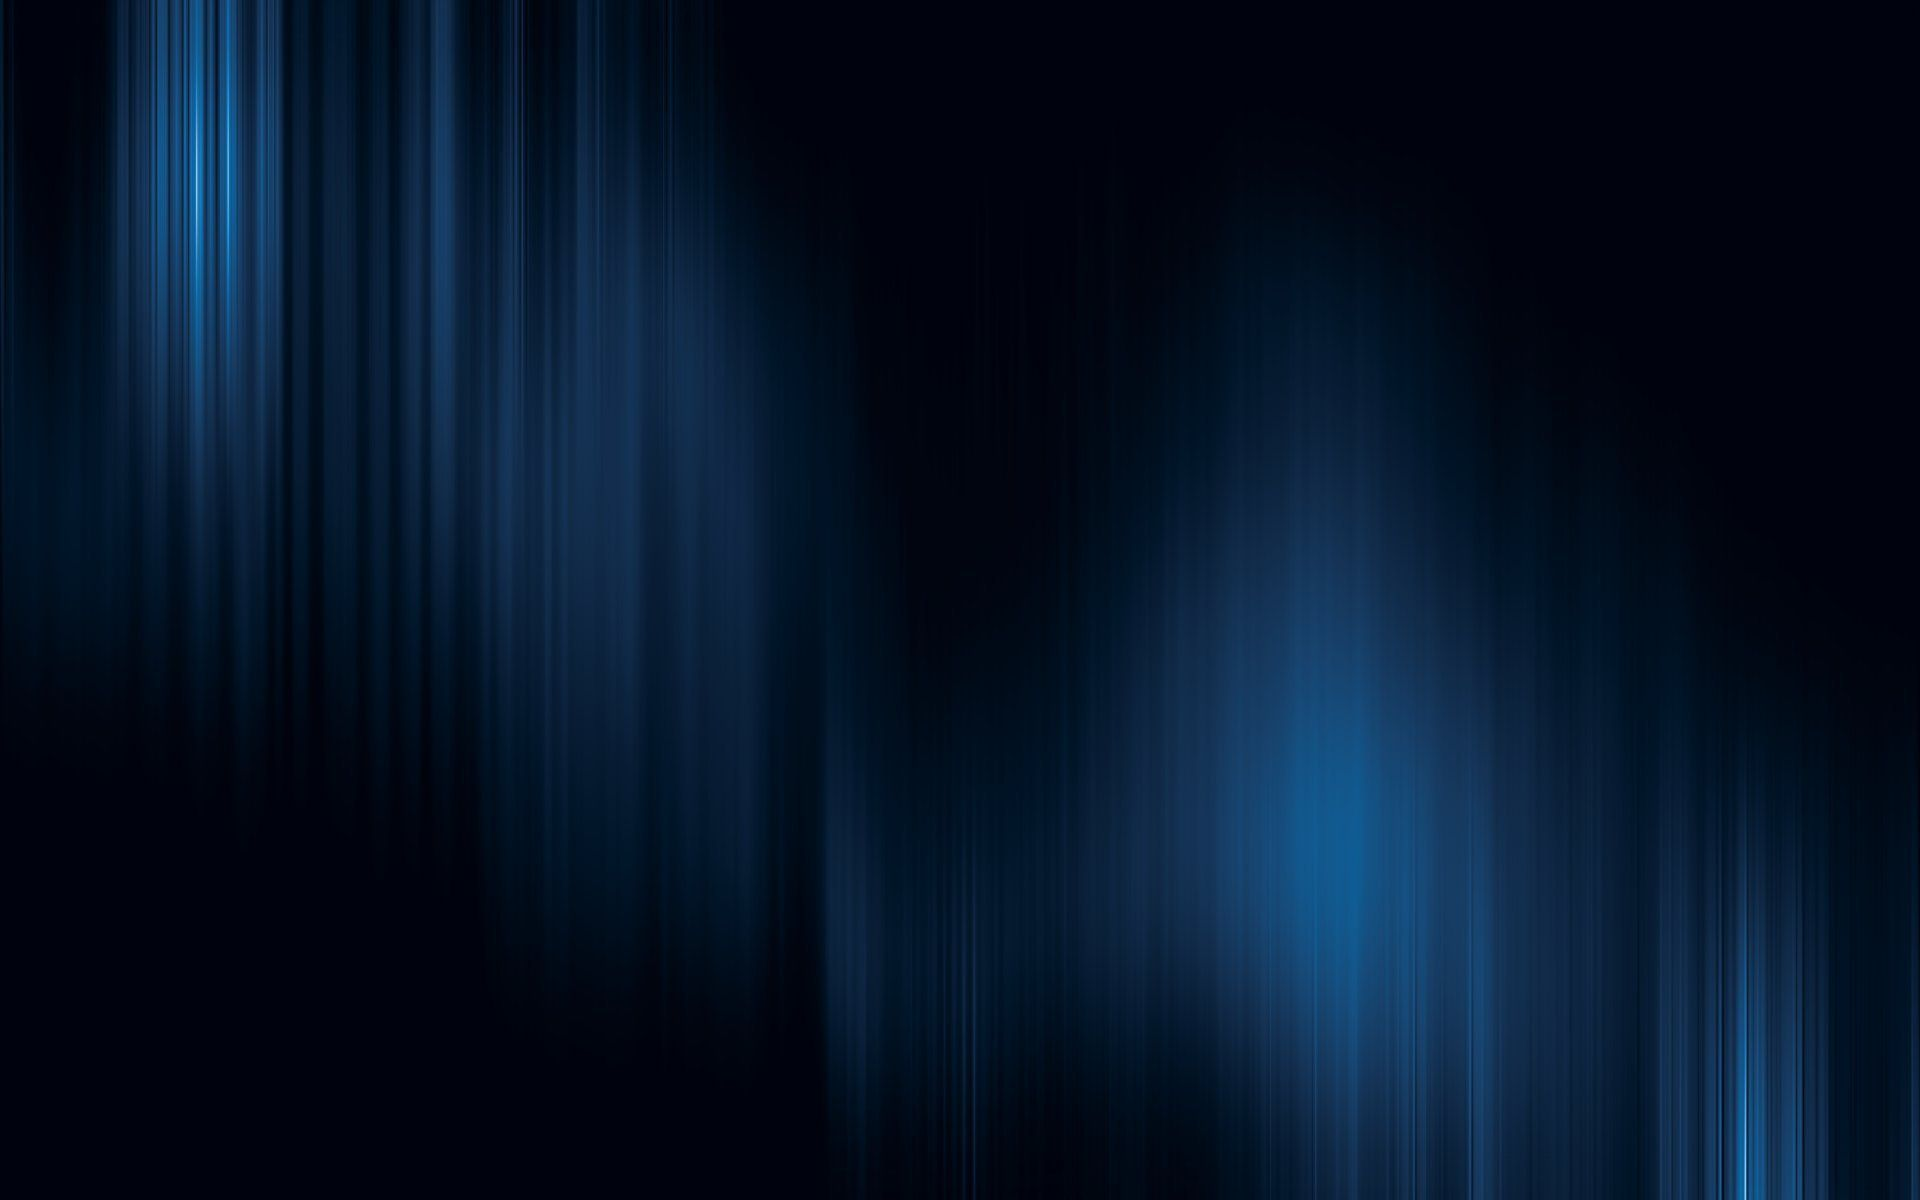 Black Background Hd Best Wallpaper Hd Black And Blue Background Black And Blue Wallpaper Black Background Wallpaper